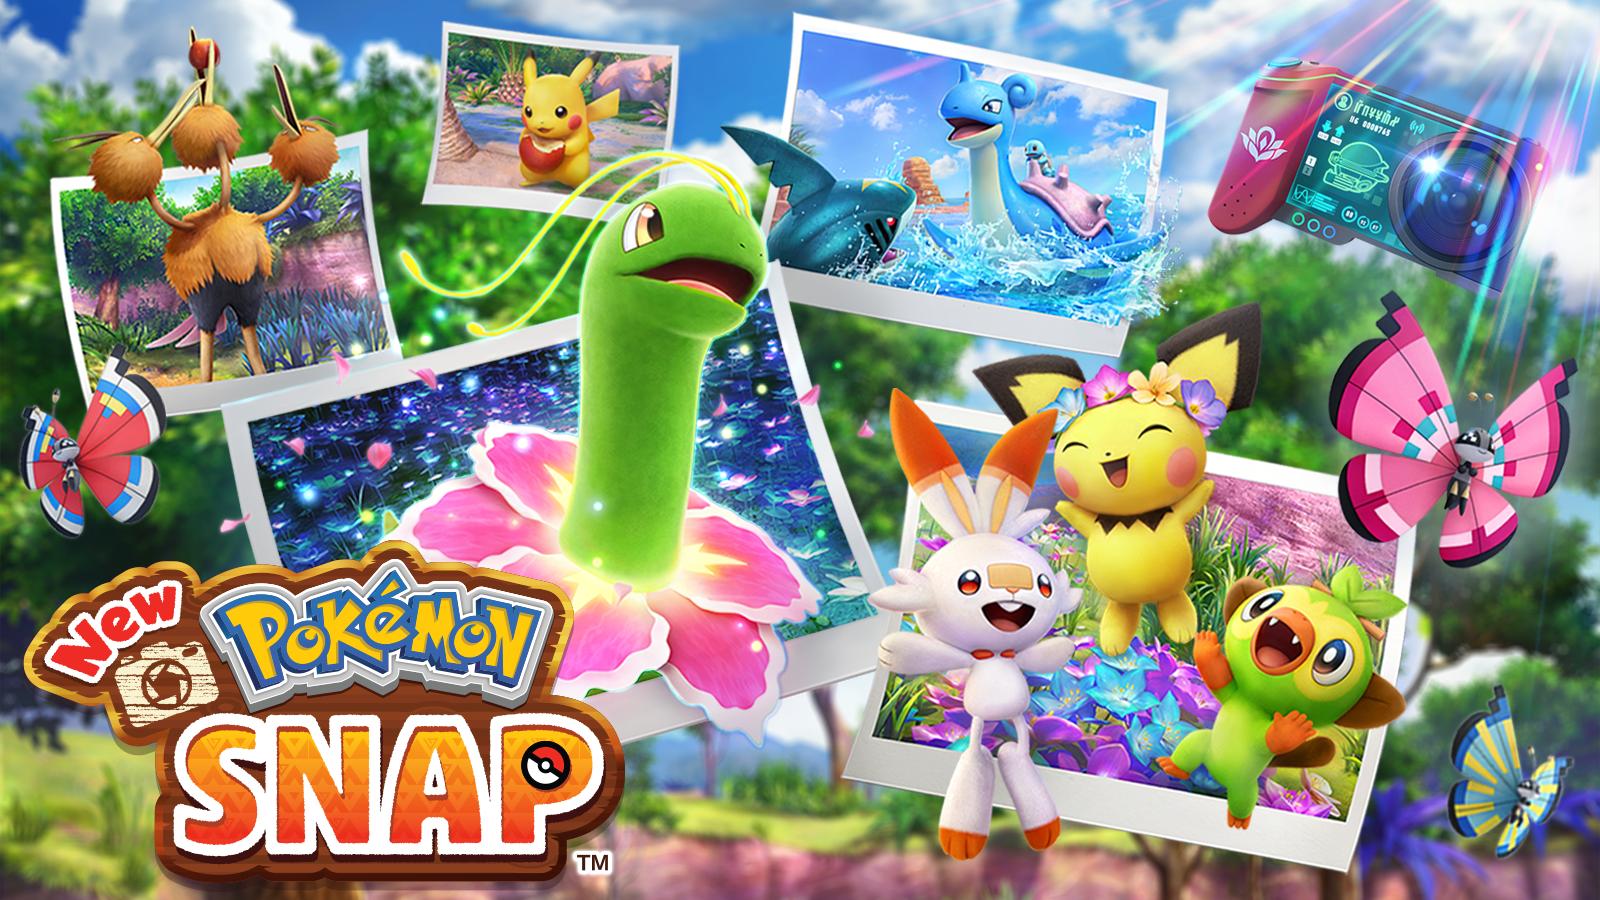 New Pokémon Snap featured image